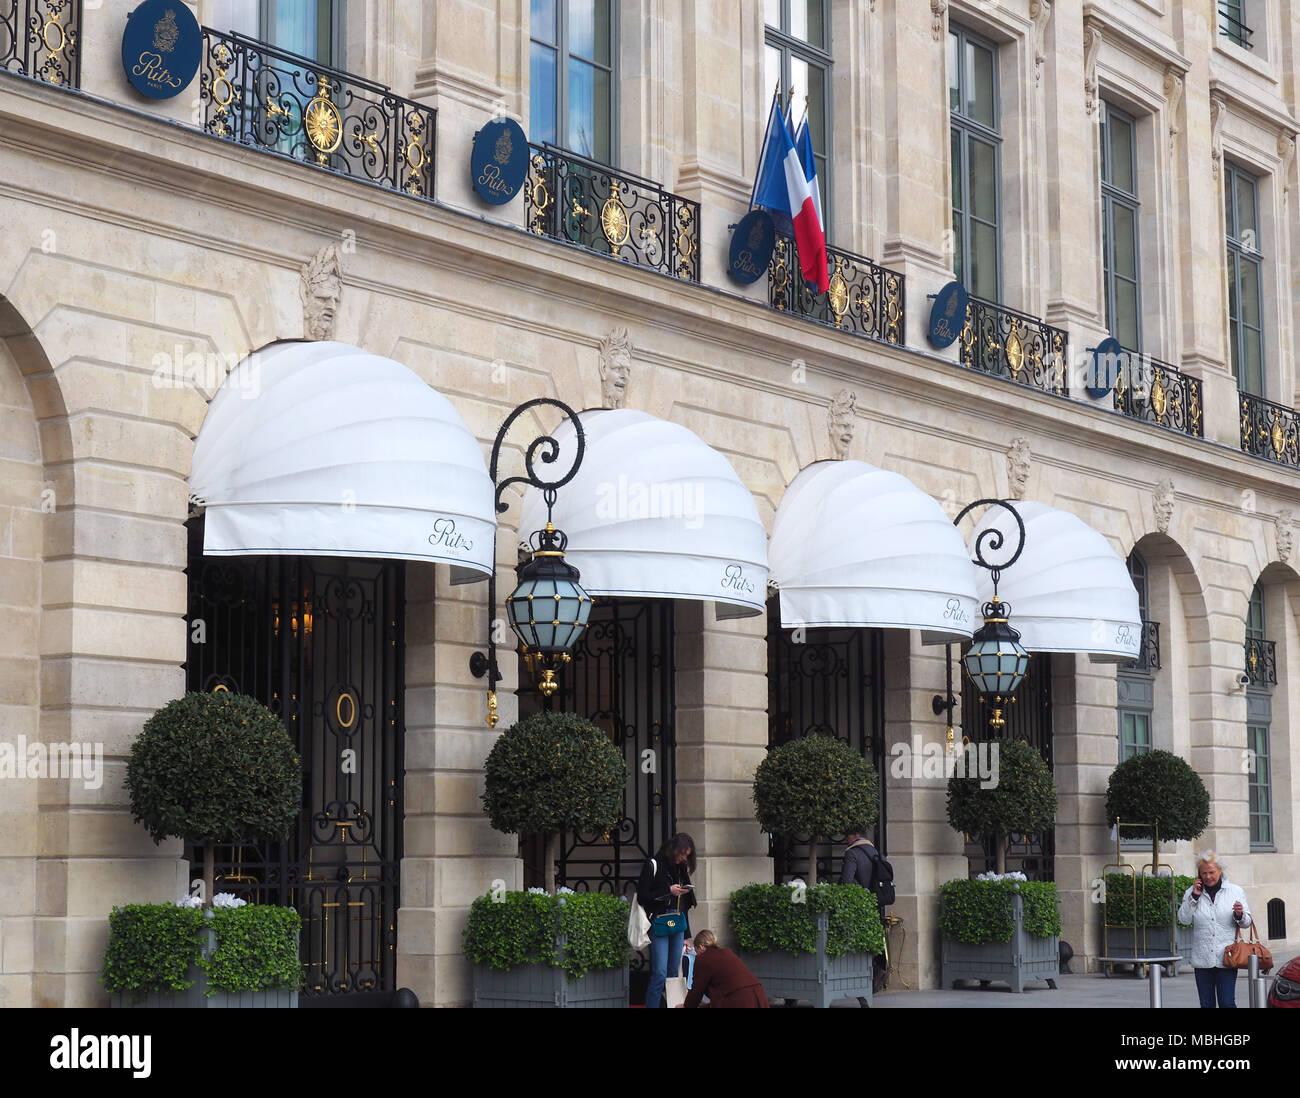 10 De Abril De 2018 Francia Paris Vista De La Entrada Del Hotel